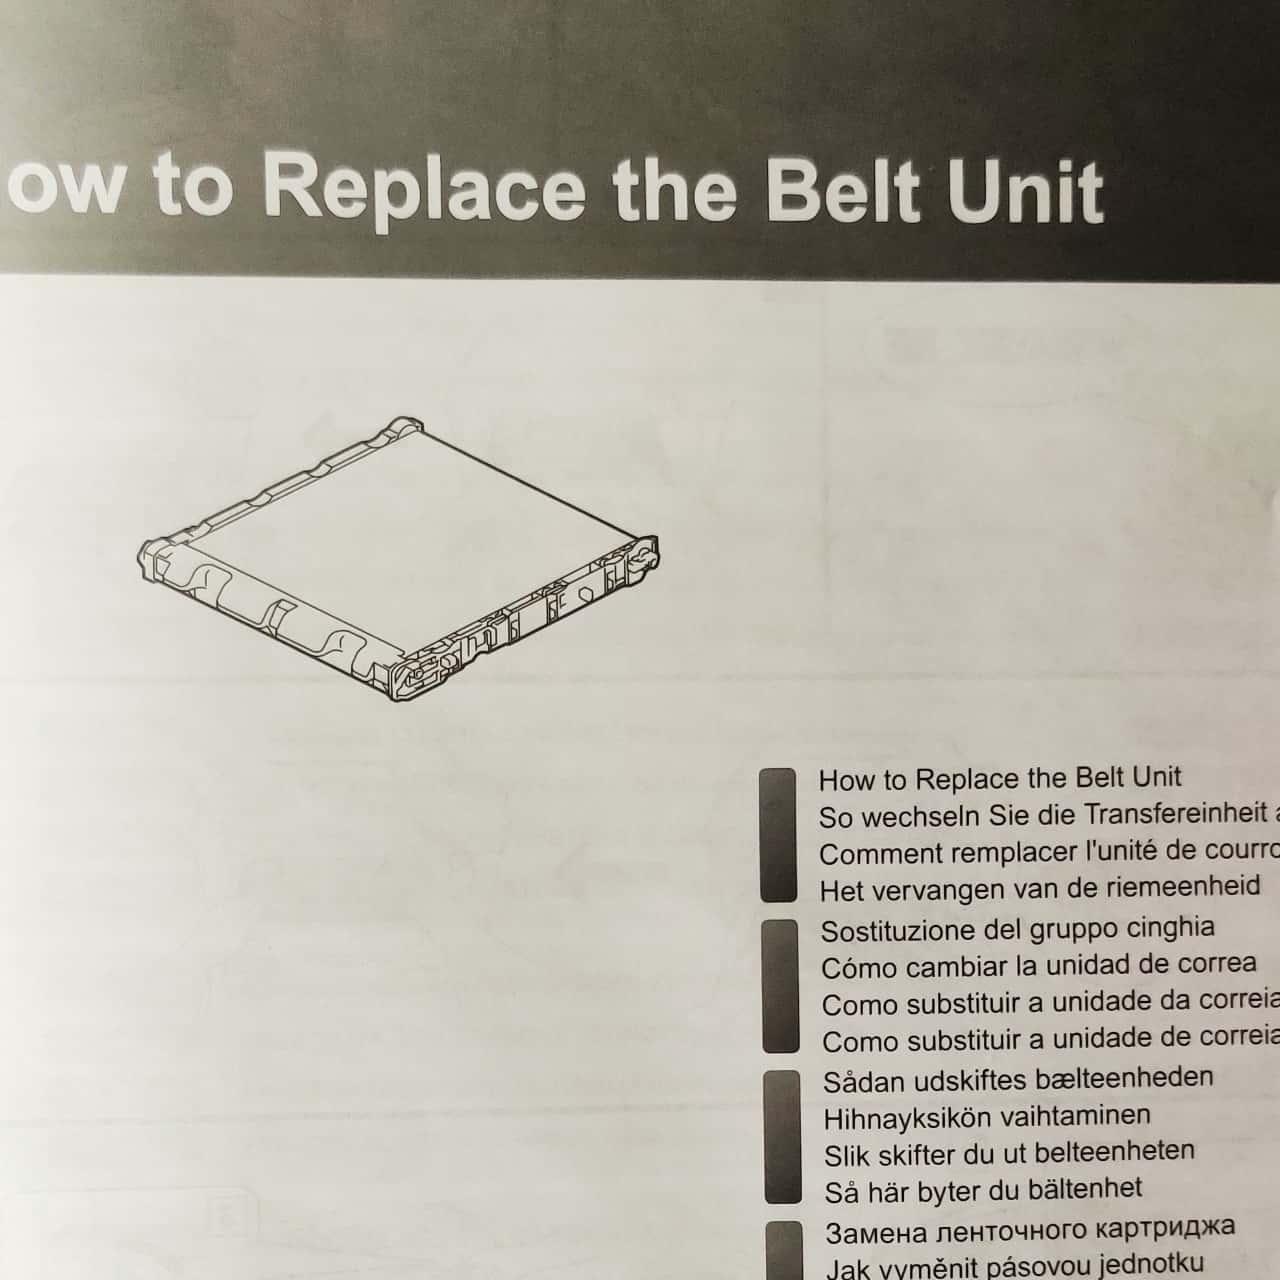 Brother BU-330CL Belt Unit for Brother Printer